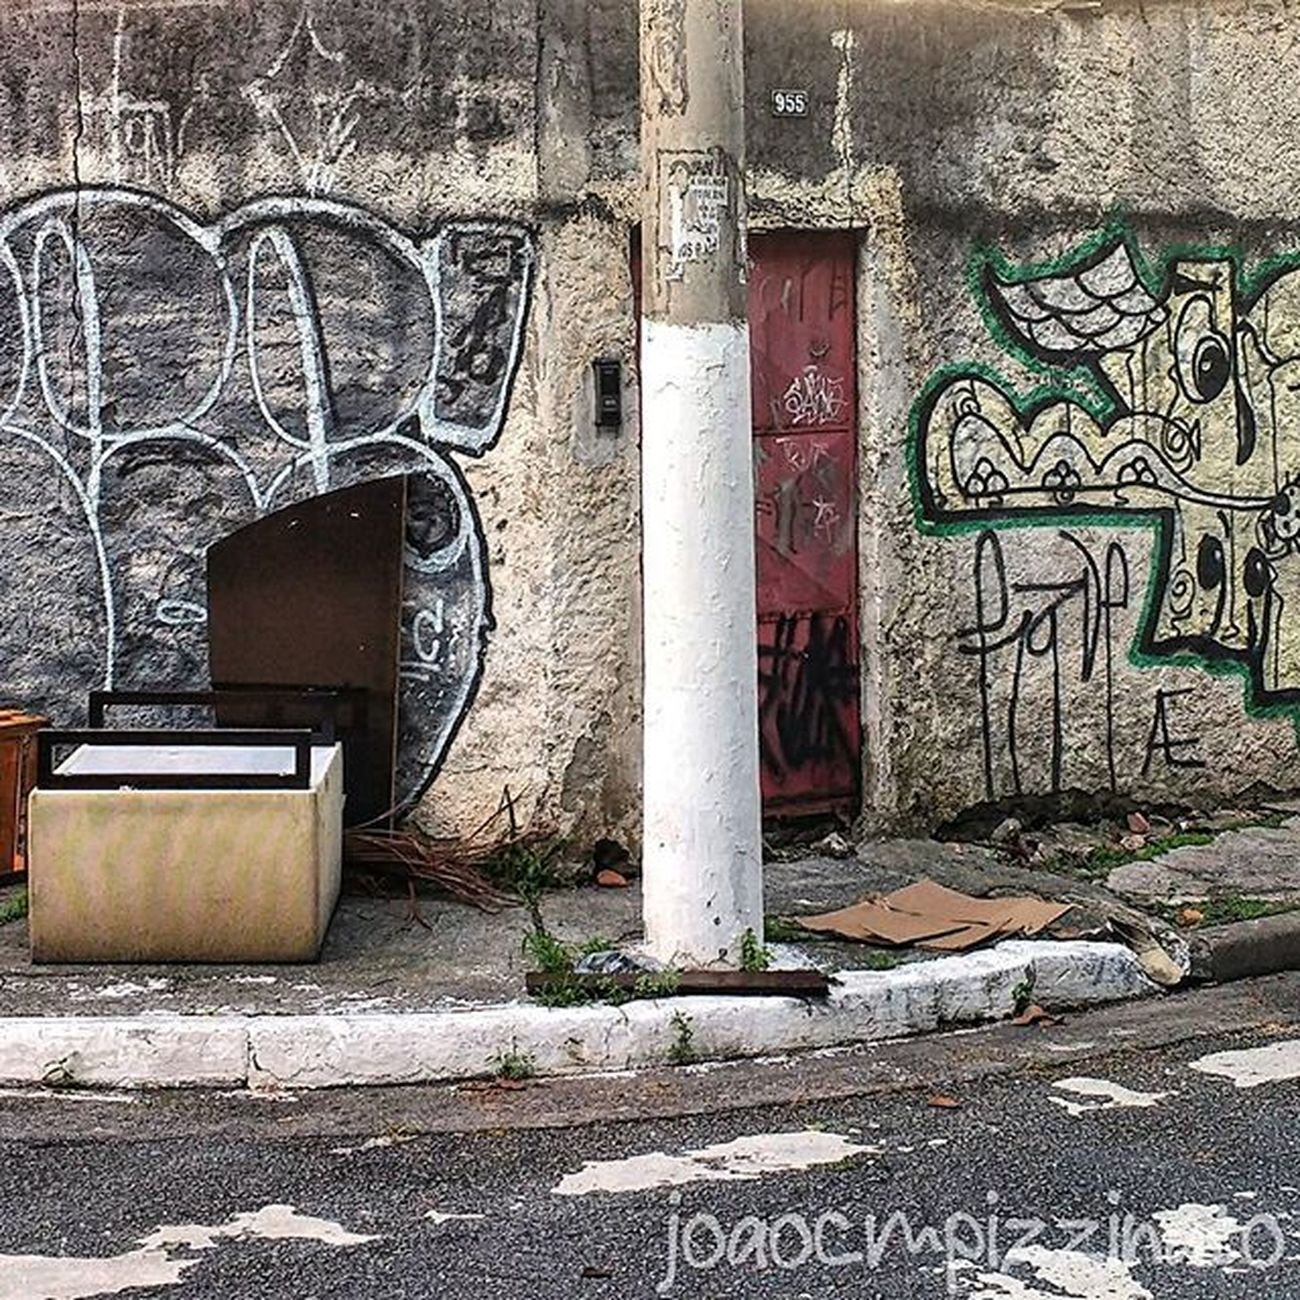 Graffiti Graffitiart Art Streetart UrbanART Streetphotography Urban Streetphoto_brasil Colors City Zonasul Saopaulo Brasil Photograph Photography Urbexbrasil Urbexsp Nasruasdesp011 Mundoruasp Olhonaruasp Flaming_abstracts